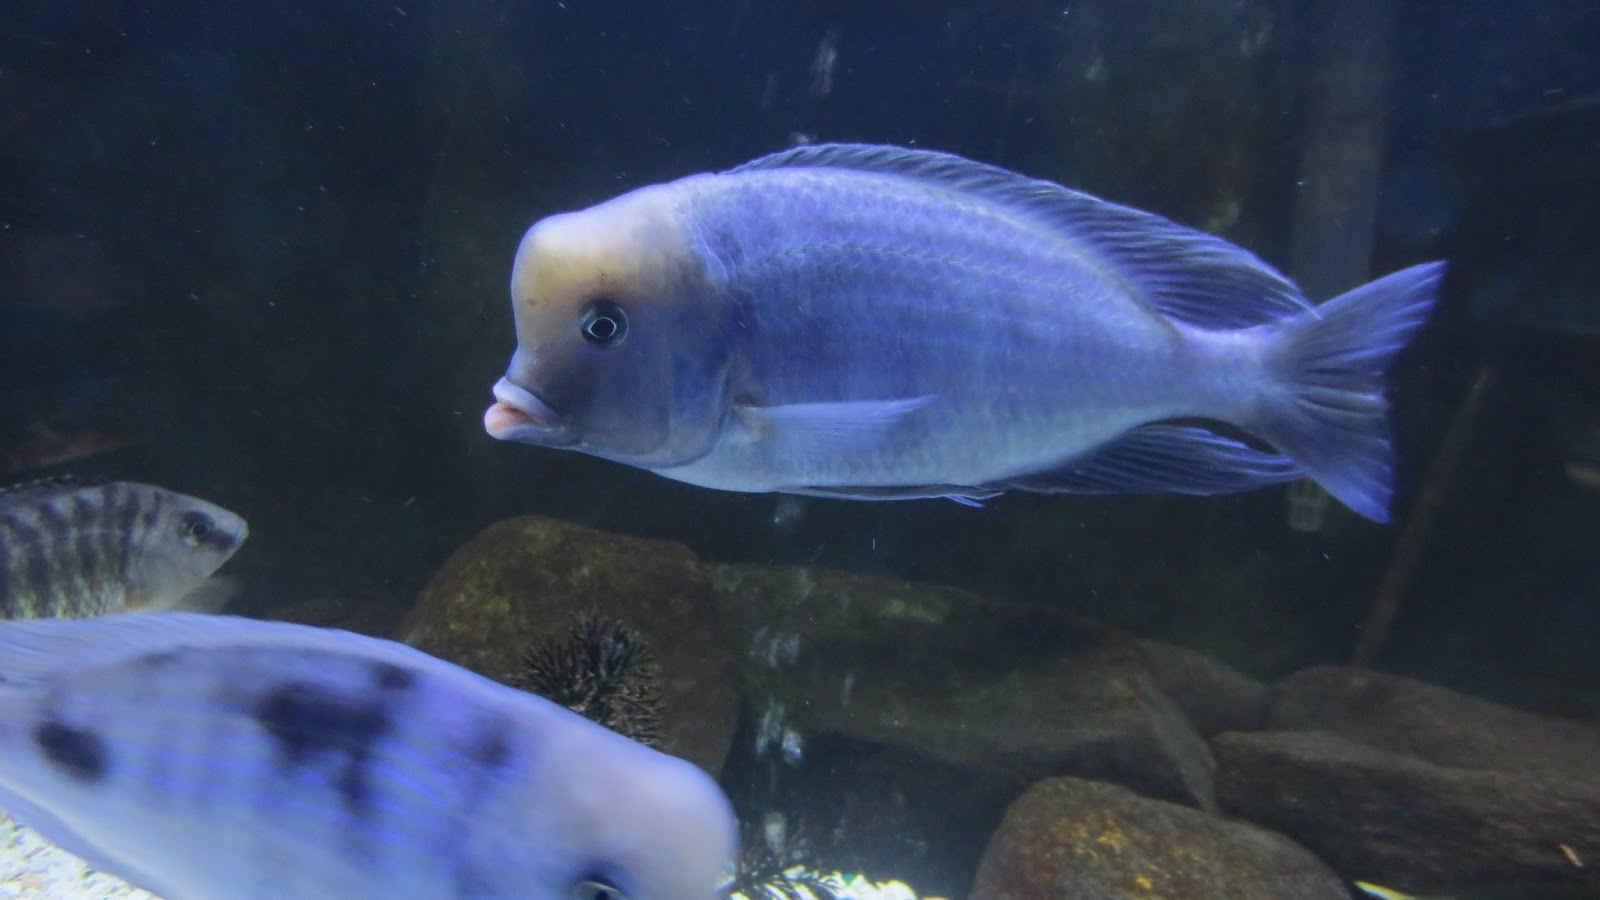 mal/tang fish: Cyrtocara moorii Blue Dolphin, 2-3-13